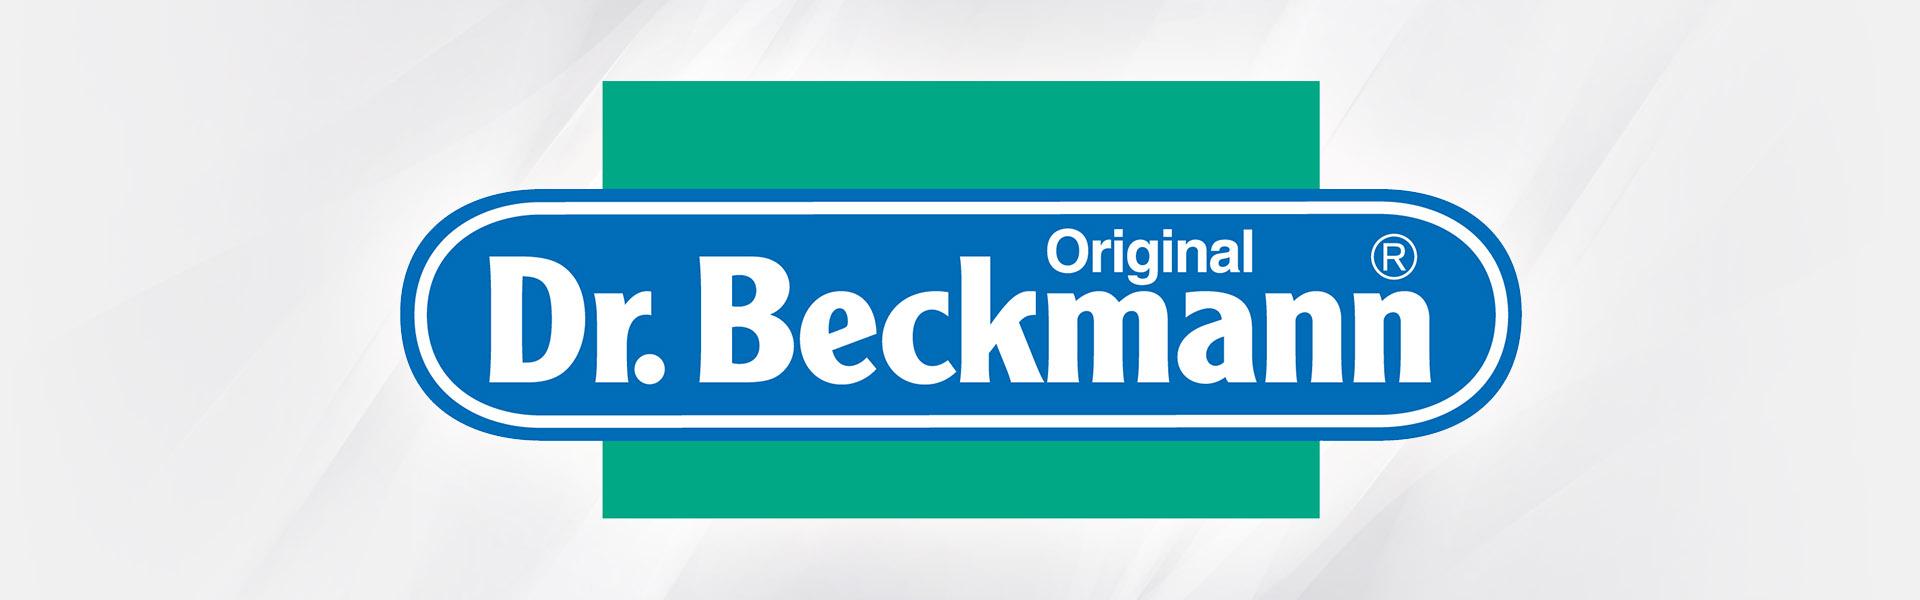 odplamiacz dr beckmann hurt